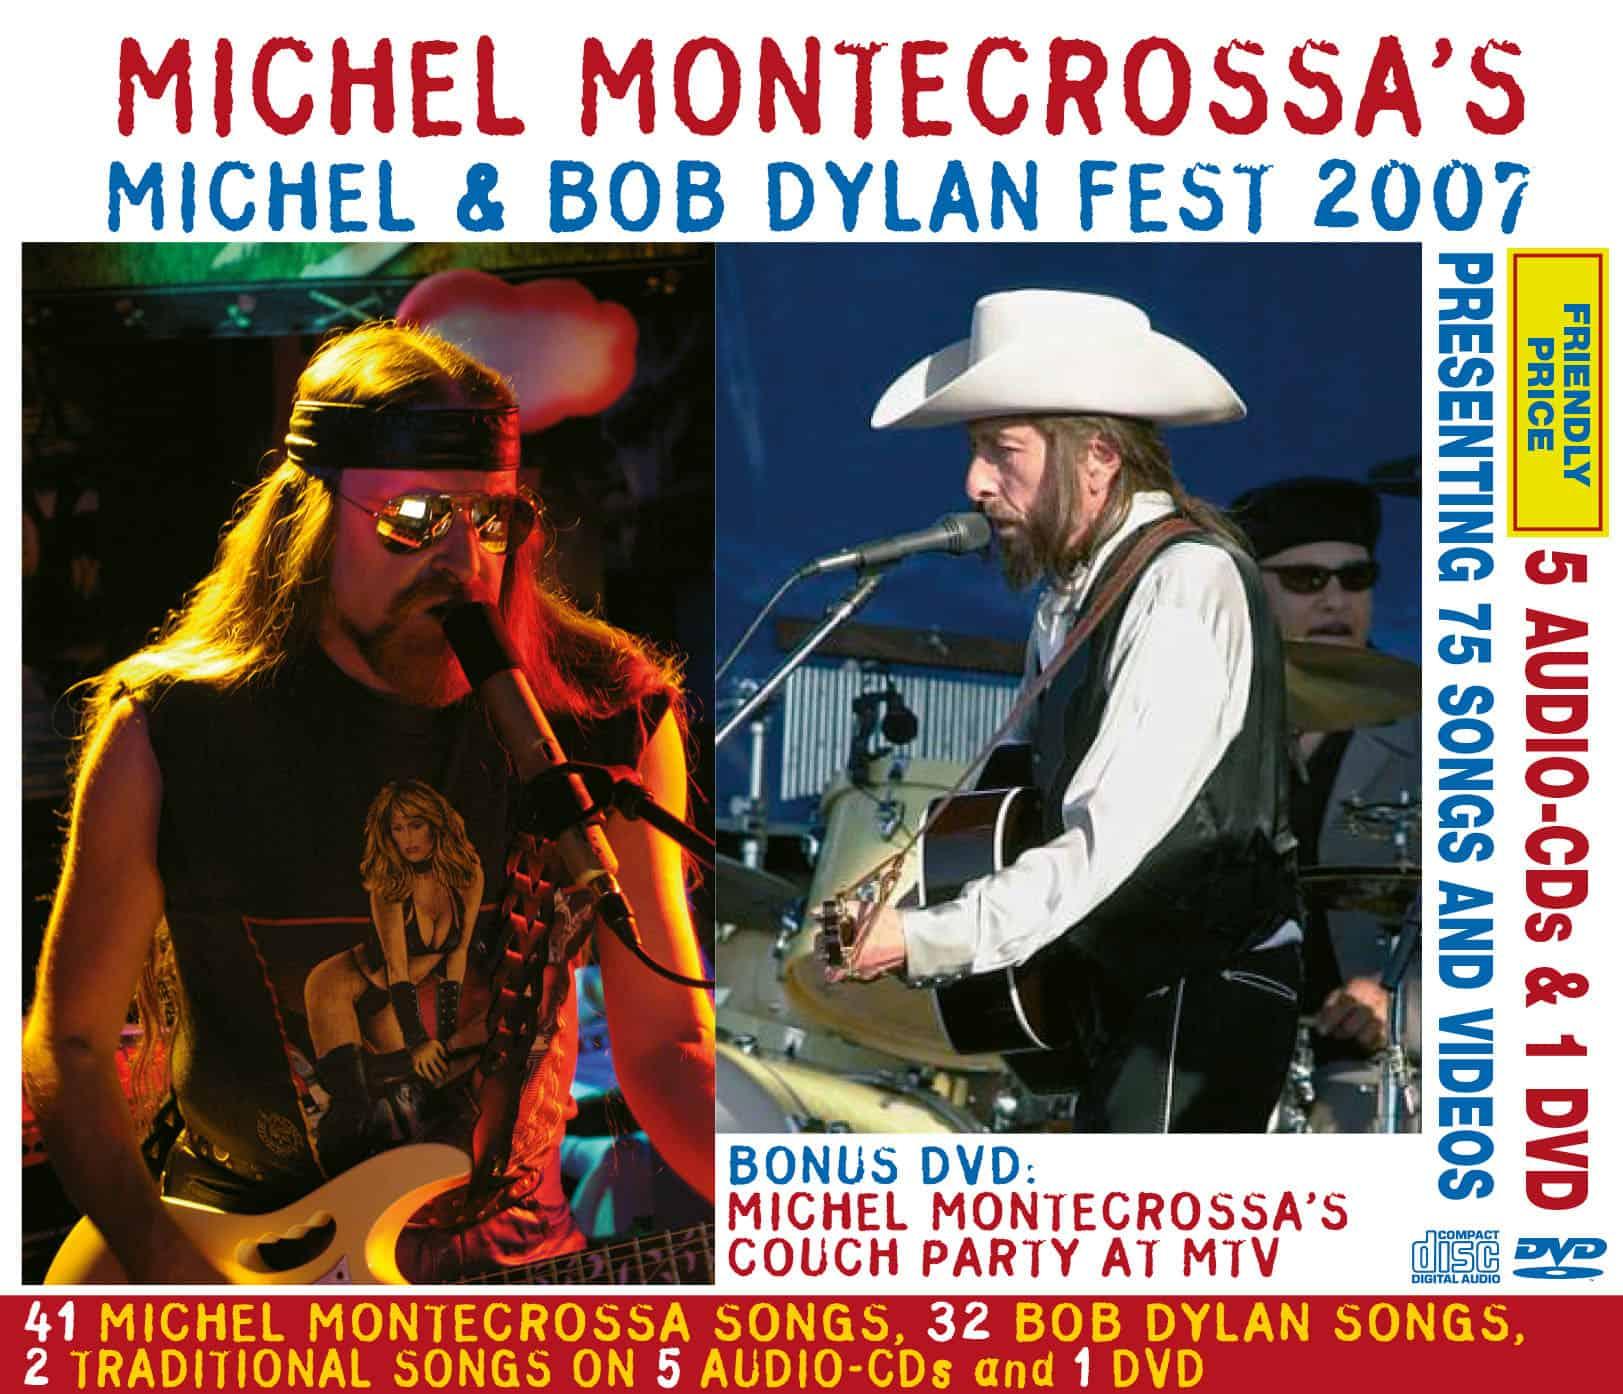 Michel Montecrossa's Michel & Bob Dylan Fest 2007